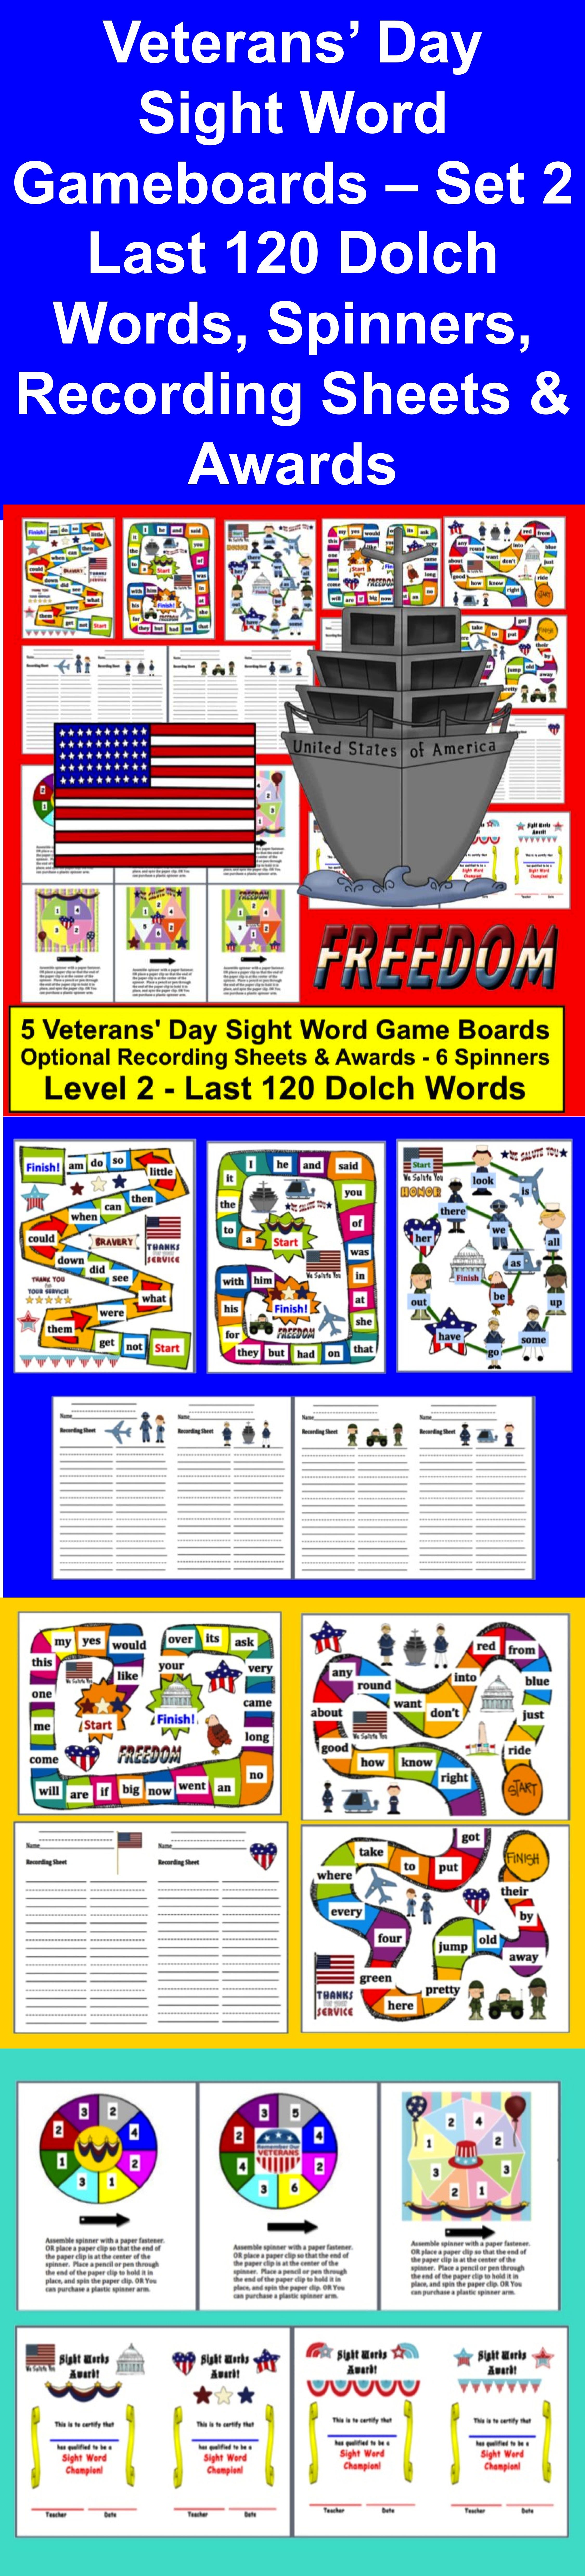 Veterans Day Patriotic Themed Sight Words Literacy